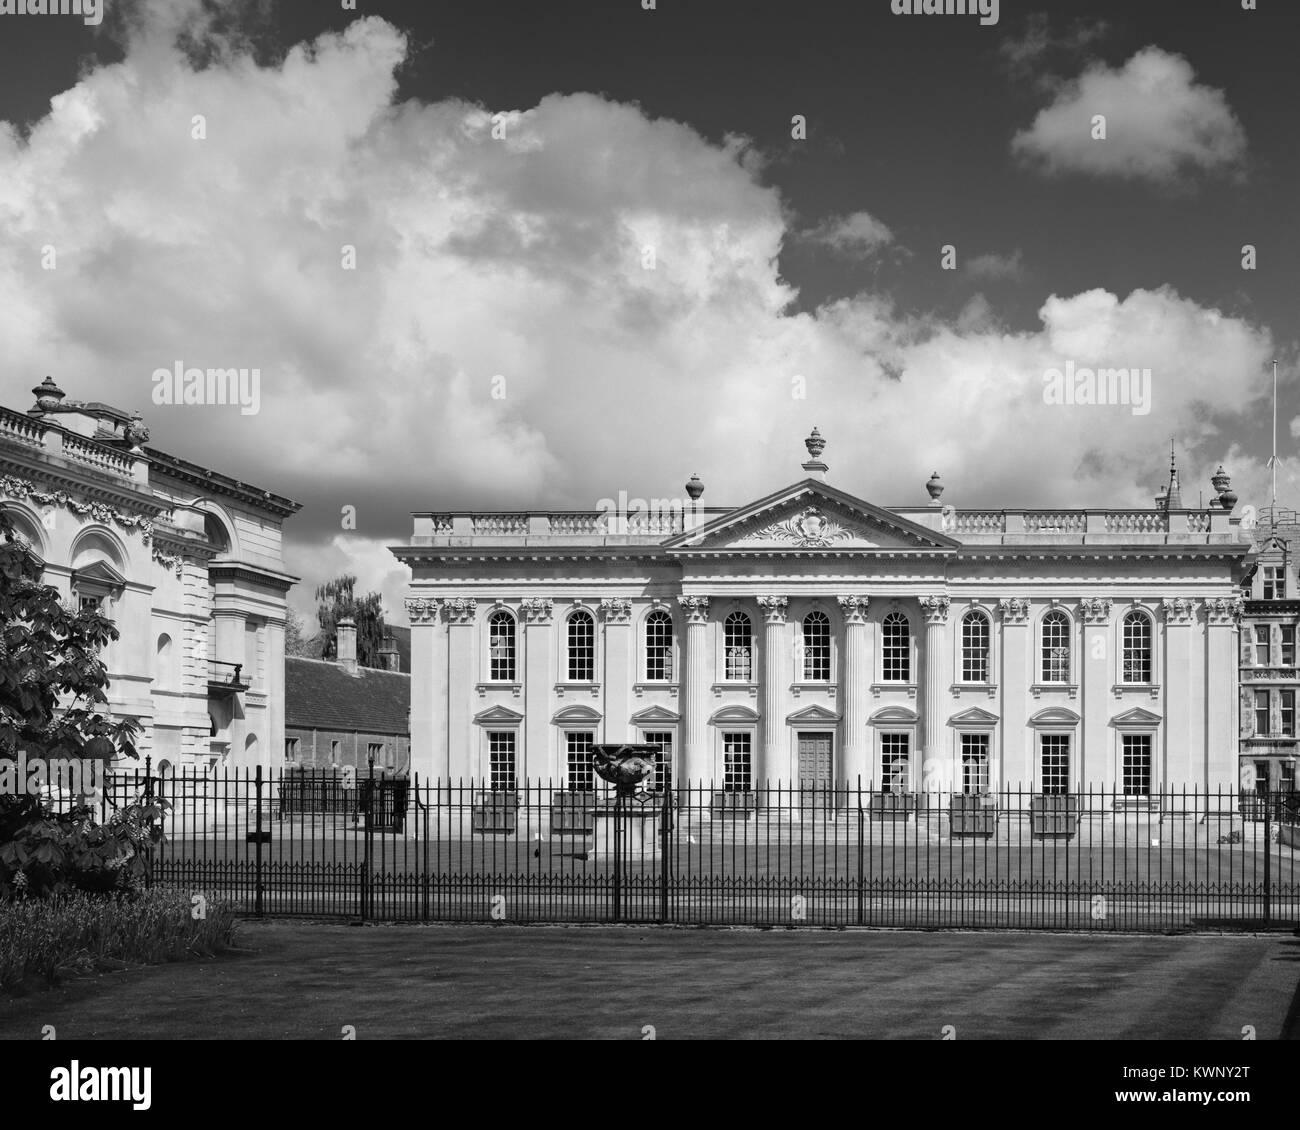 Cambridge University Senate House and Old Schools on King's Parade - Stock Image